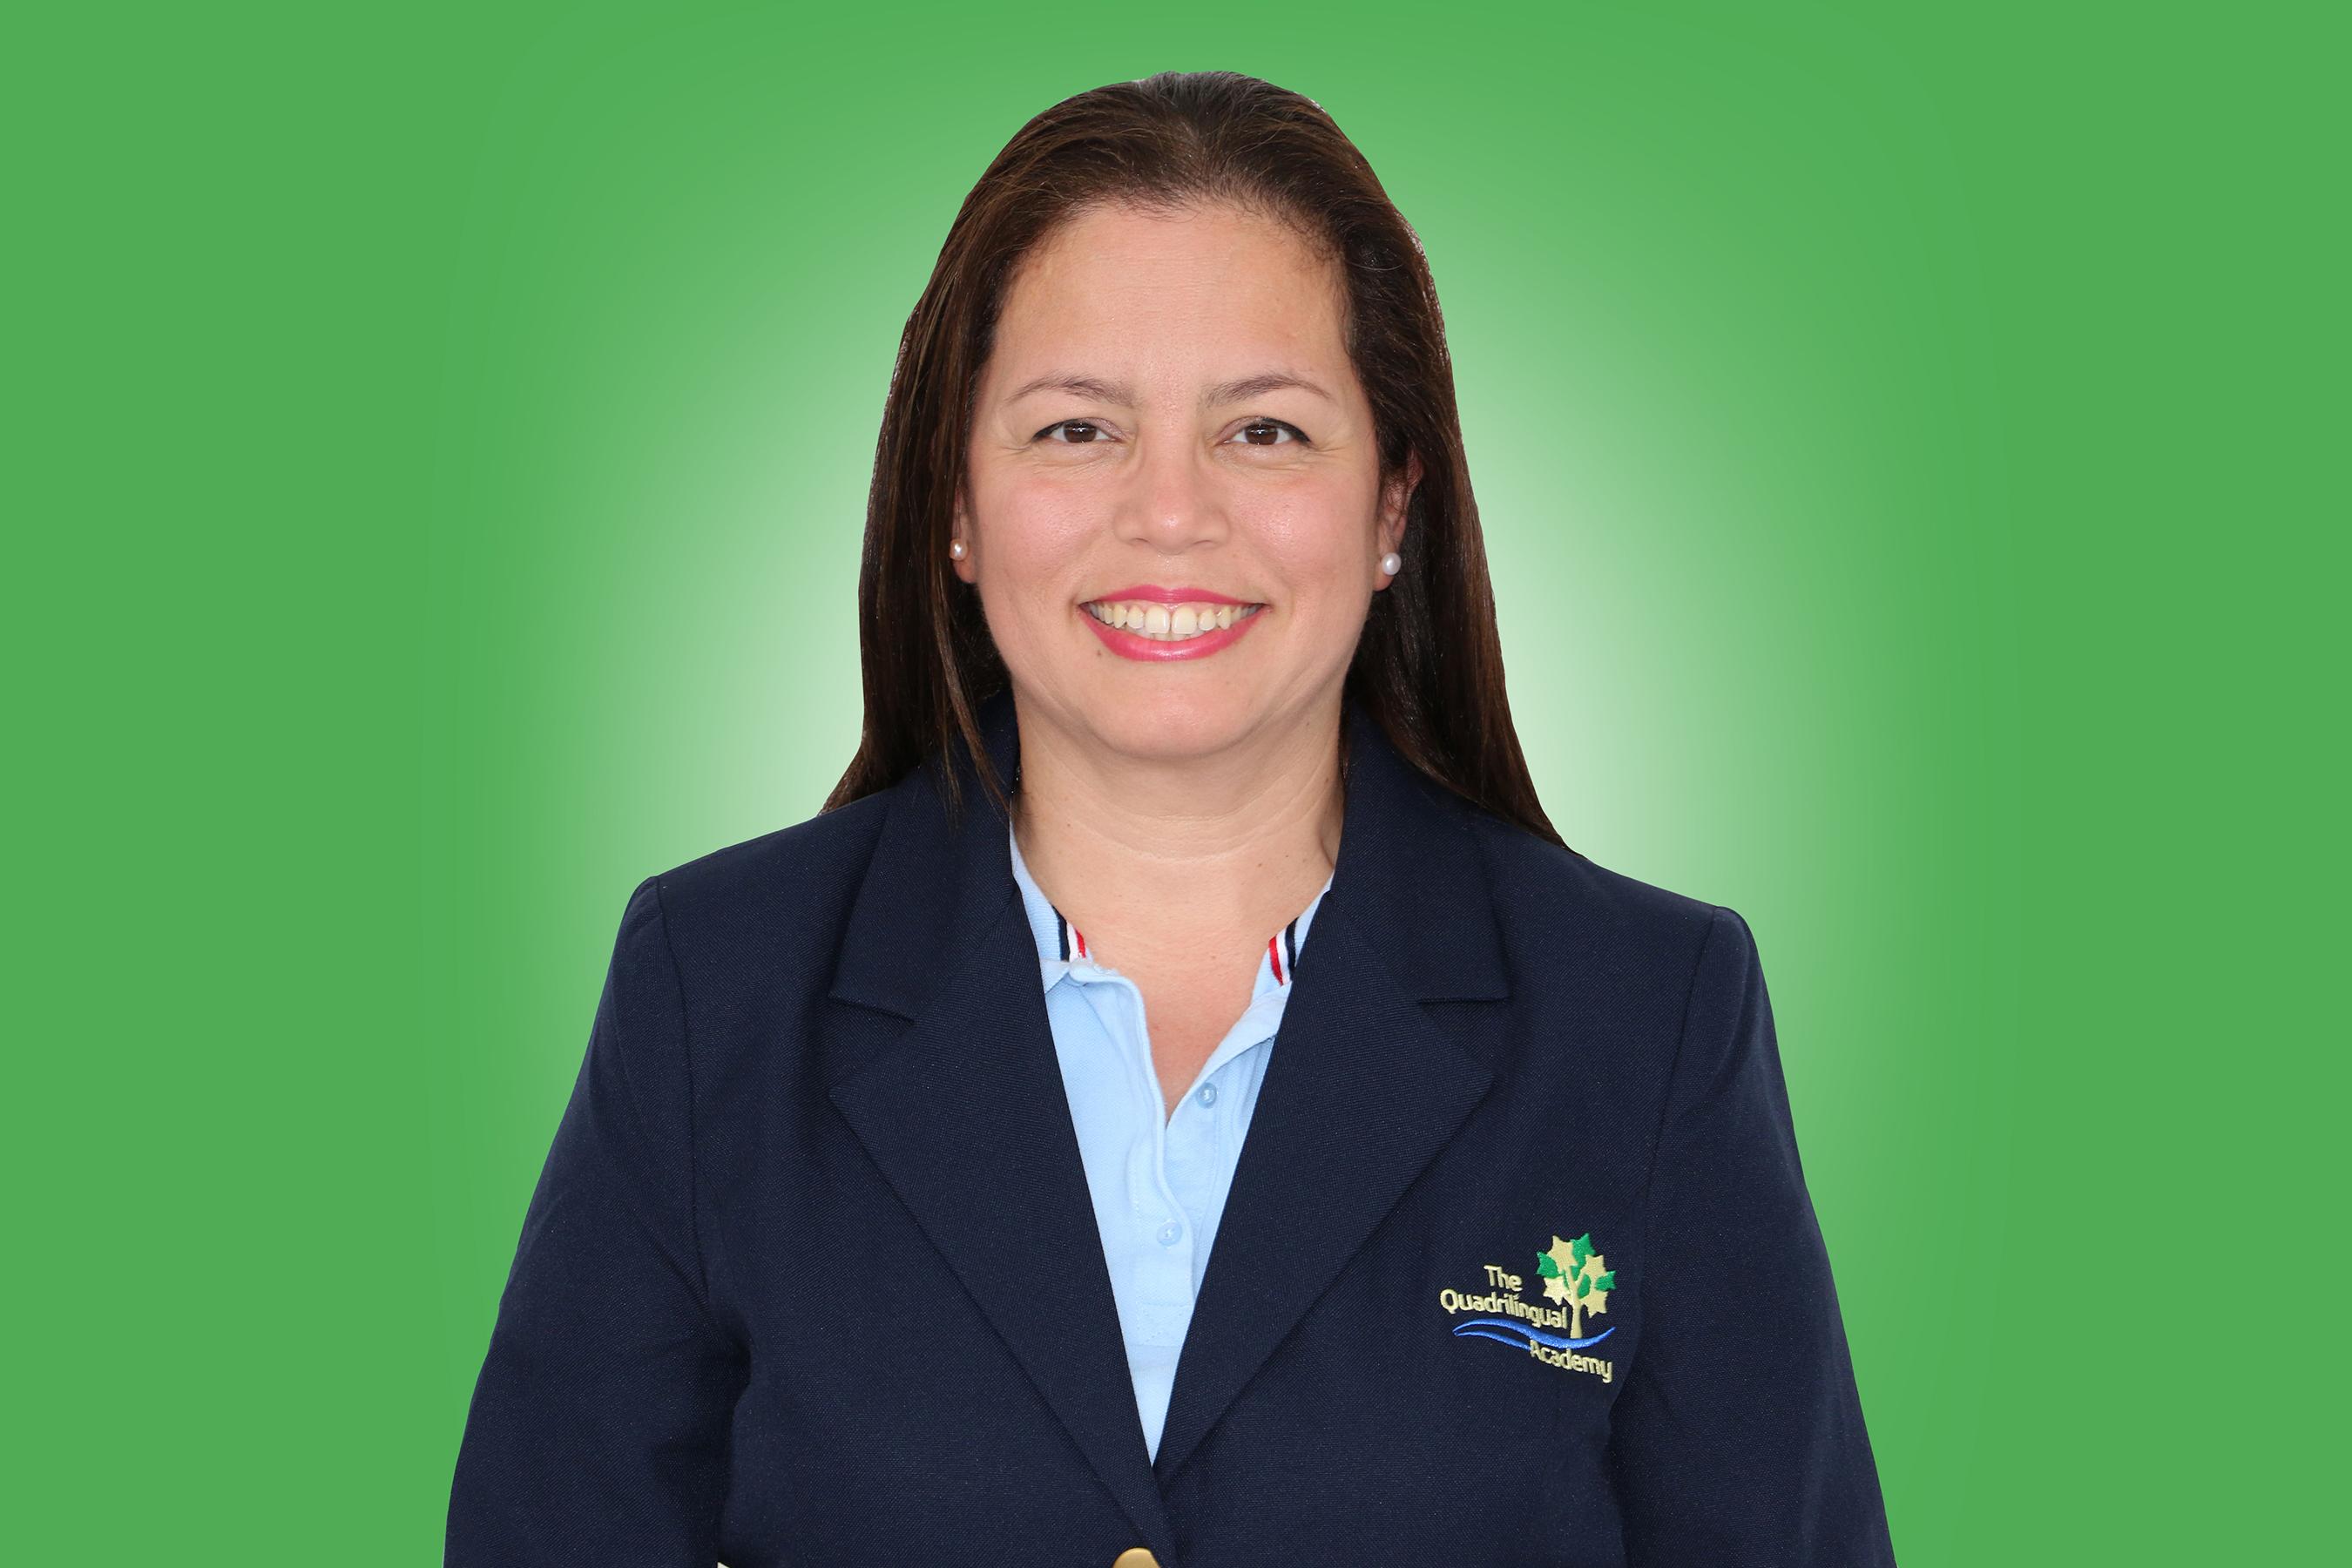 Liliana Caldera